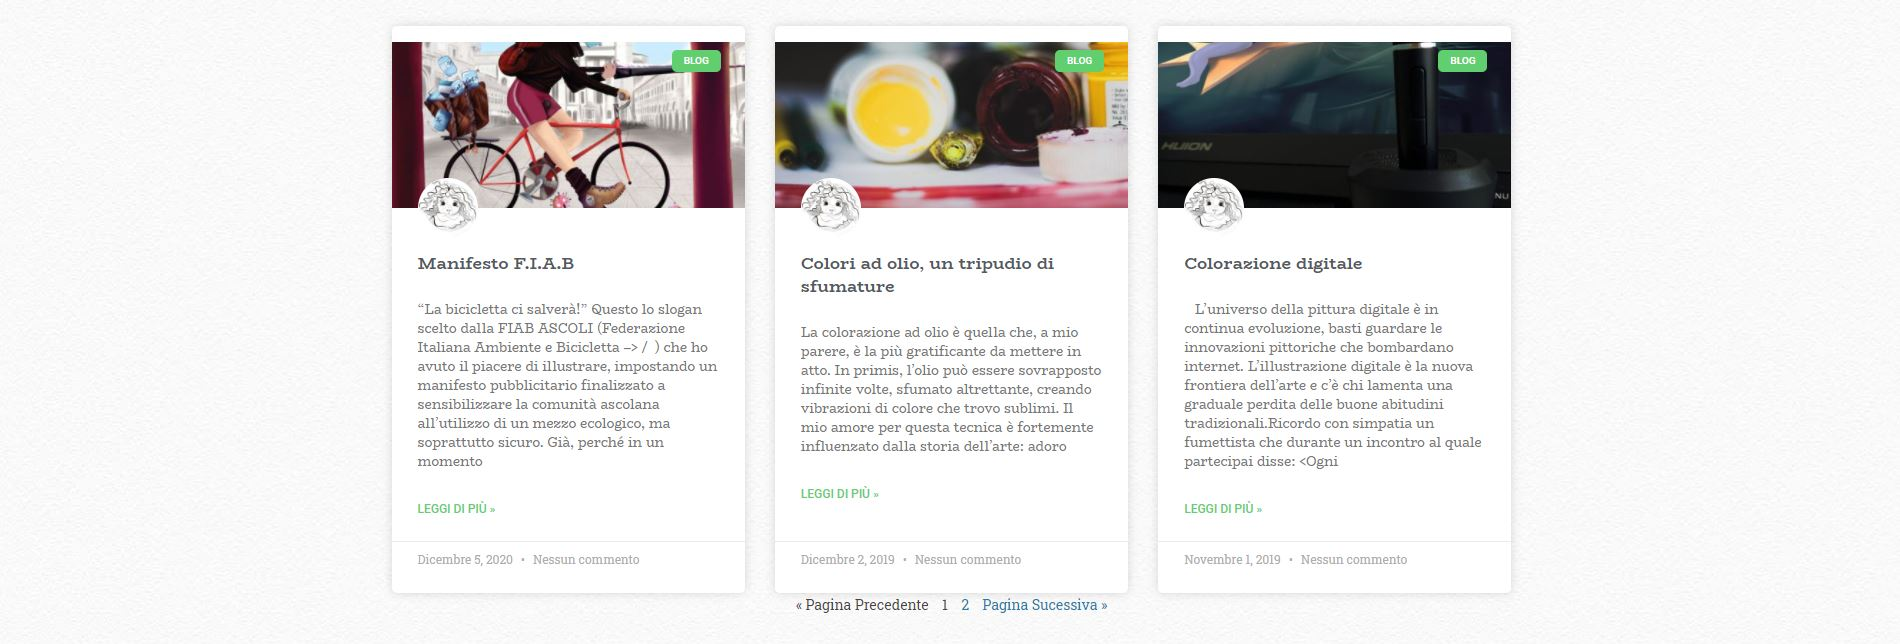 carlotta-paoletti-hirostudios-005